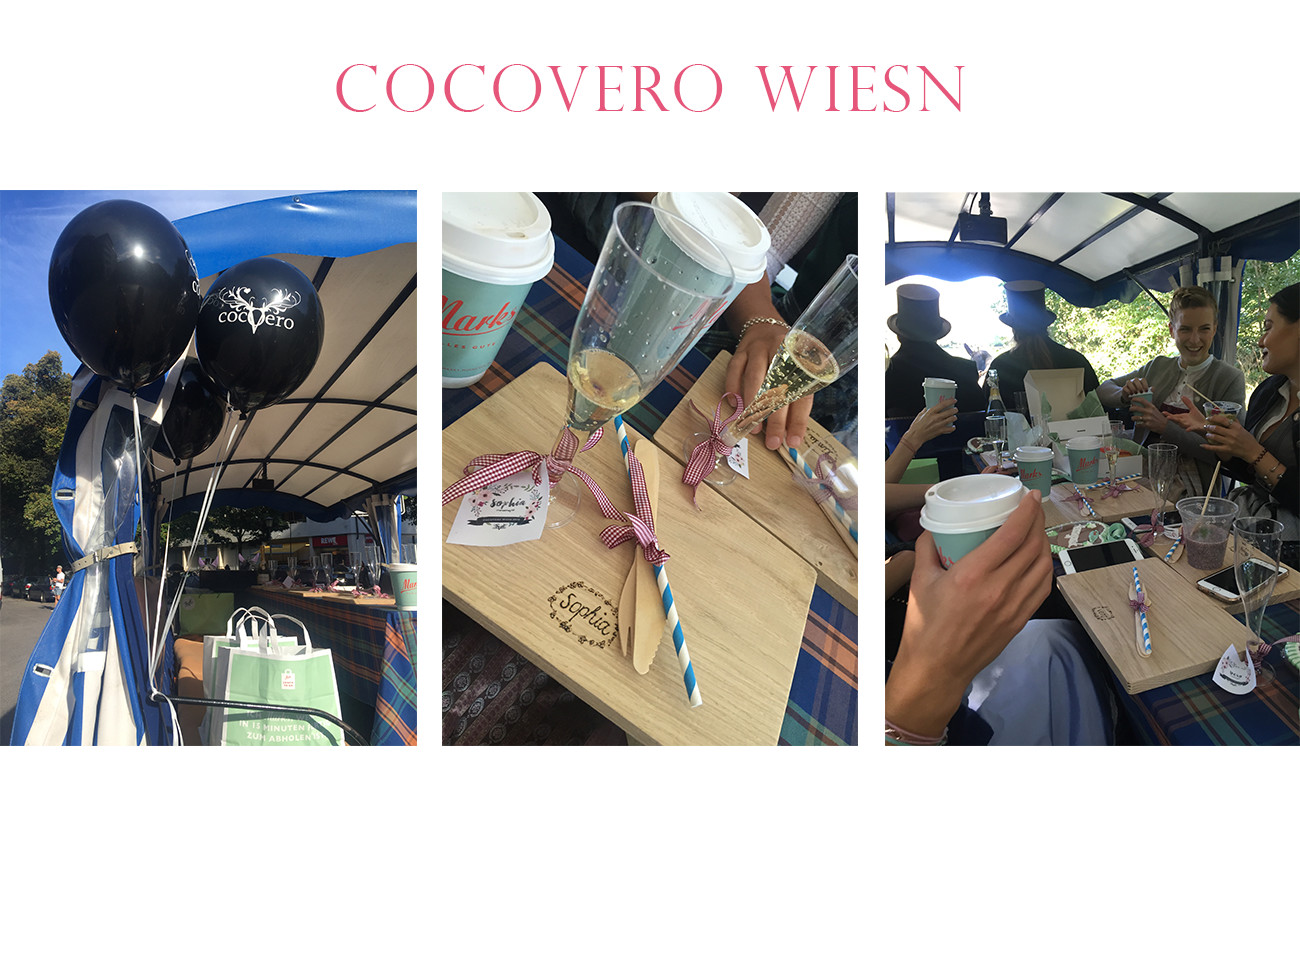 cocoverowiesn-wiesn-oktoberfest-munich-sequinsophia-1-unbenannt-4